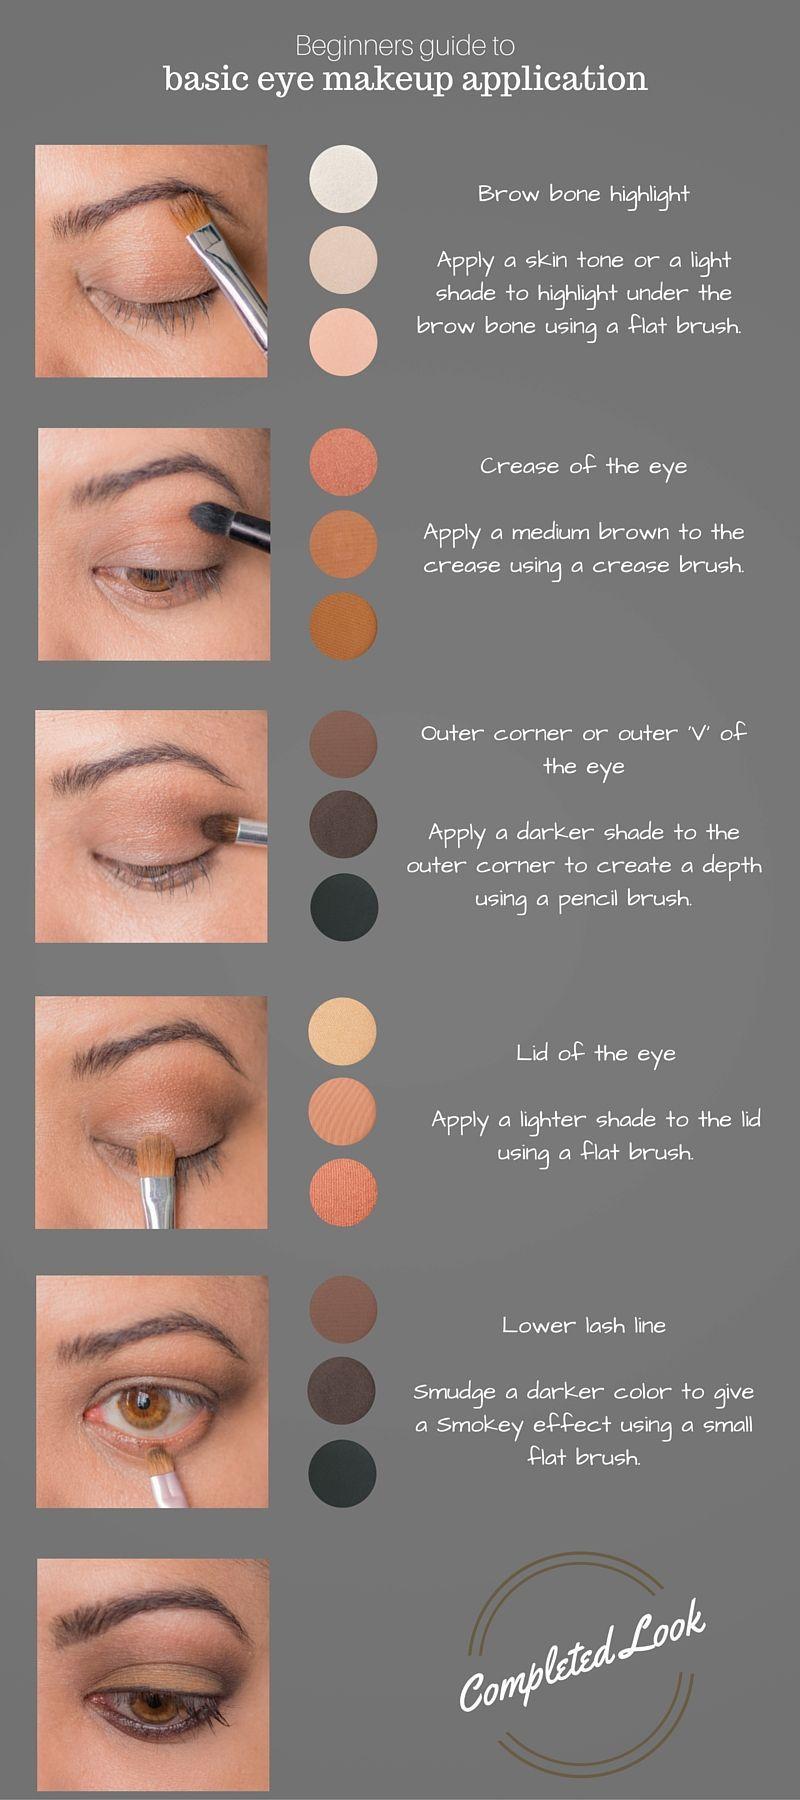 Beginners Eye Makeup Guide Makeupideasdramatic Beginners Eye Makeup Basic Eye Makeup Eye Makeup Guide